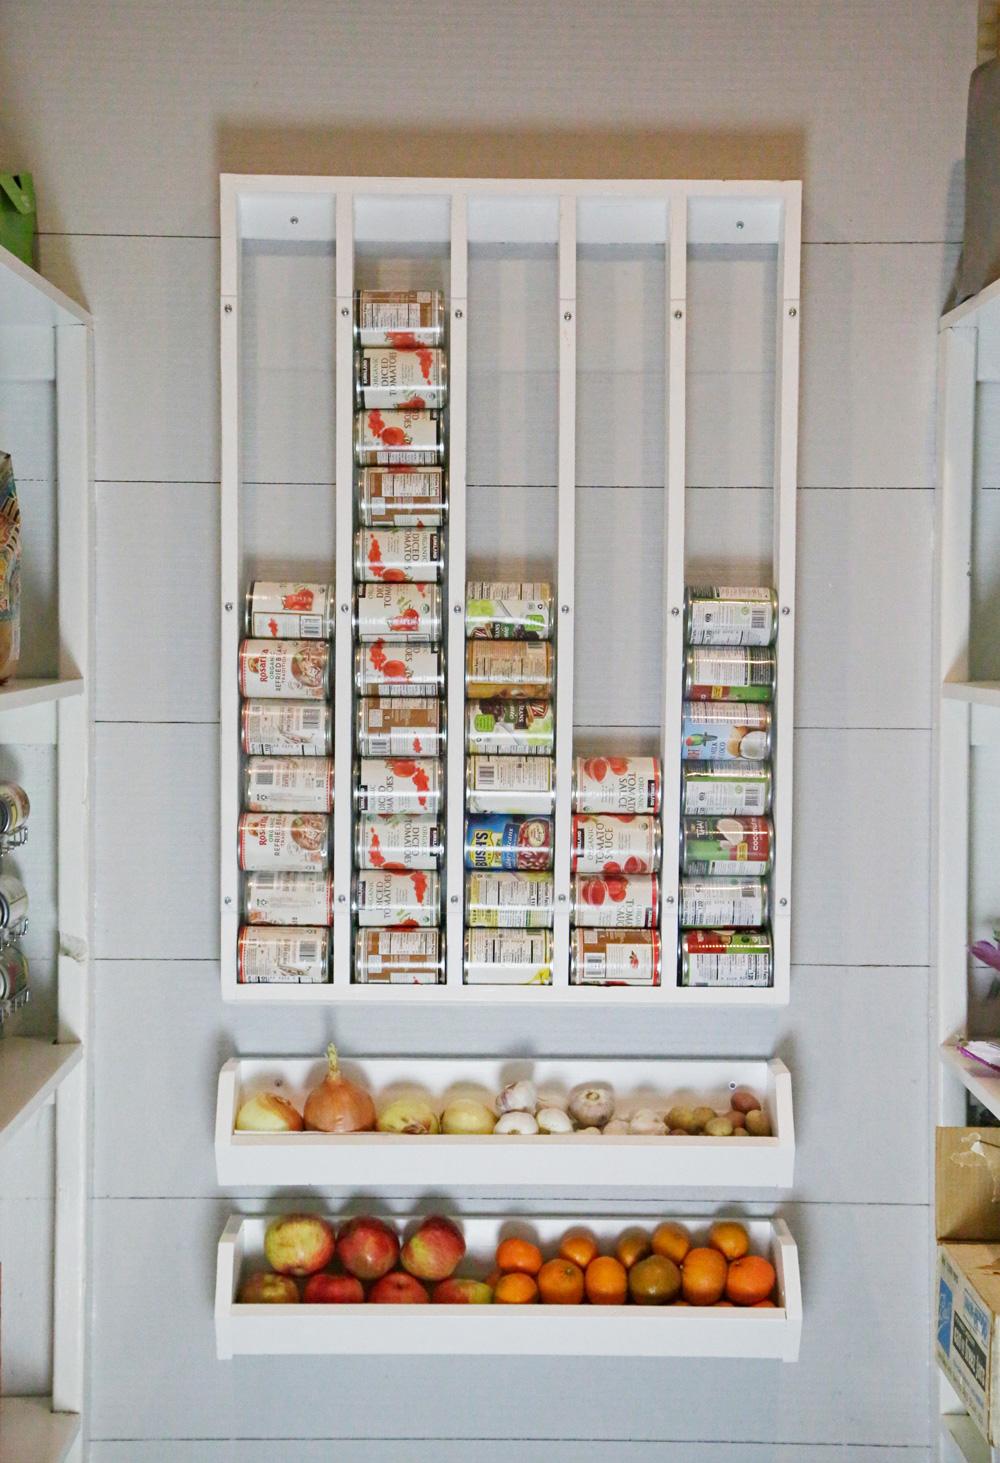 Vegetable Storage Potato And Onion Bin Wall Mounted